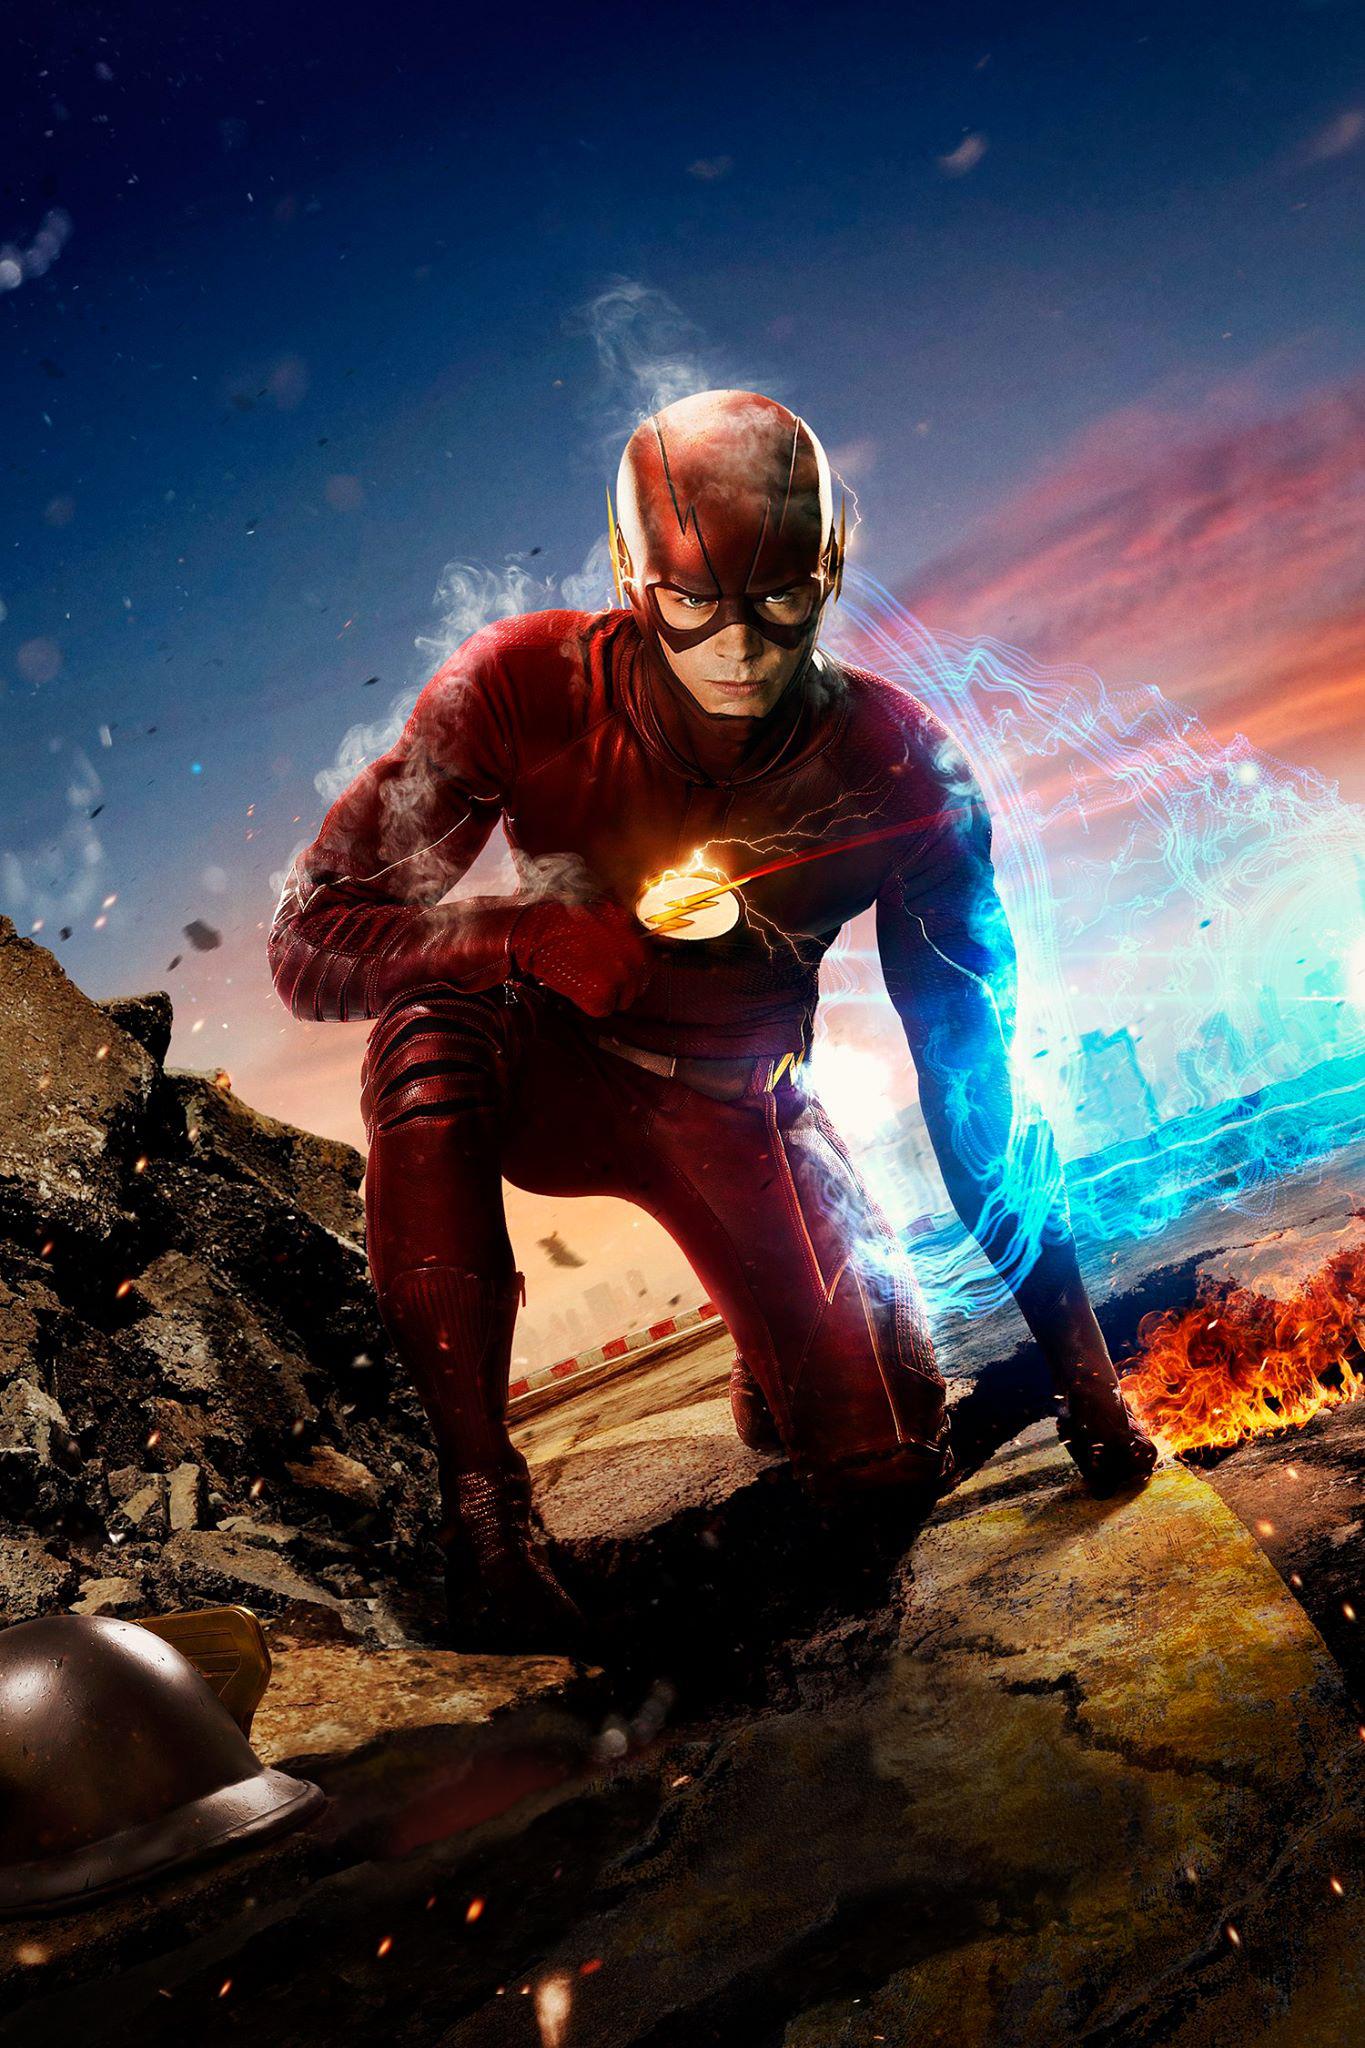 Coolrod85/PG Proposal:Barry Allen (Arrowverse)